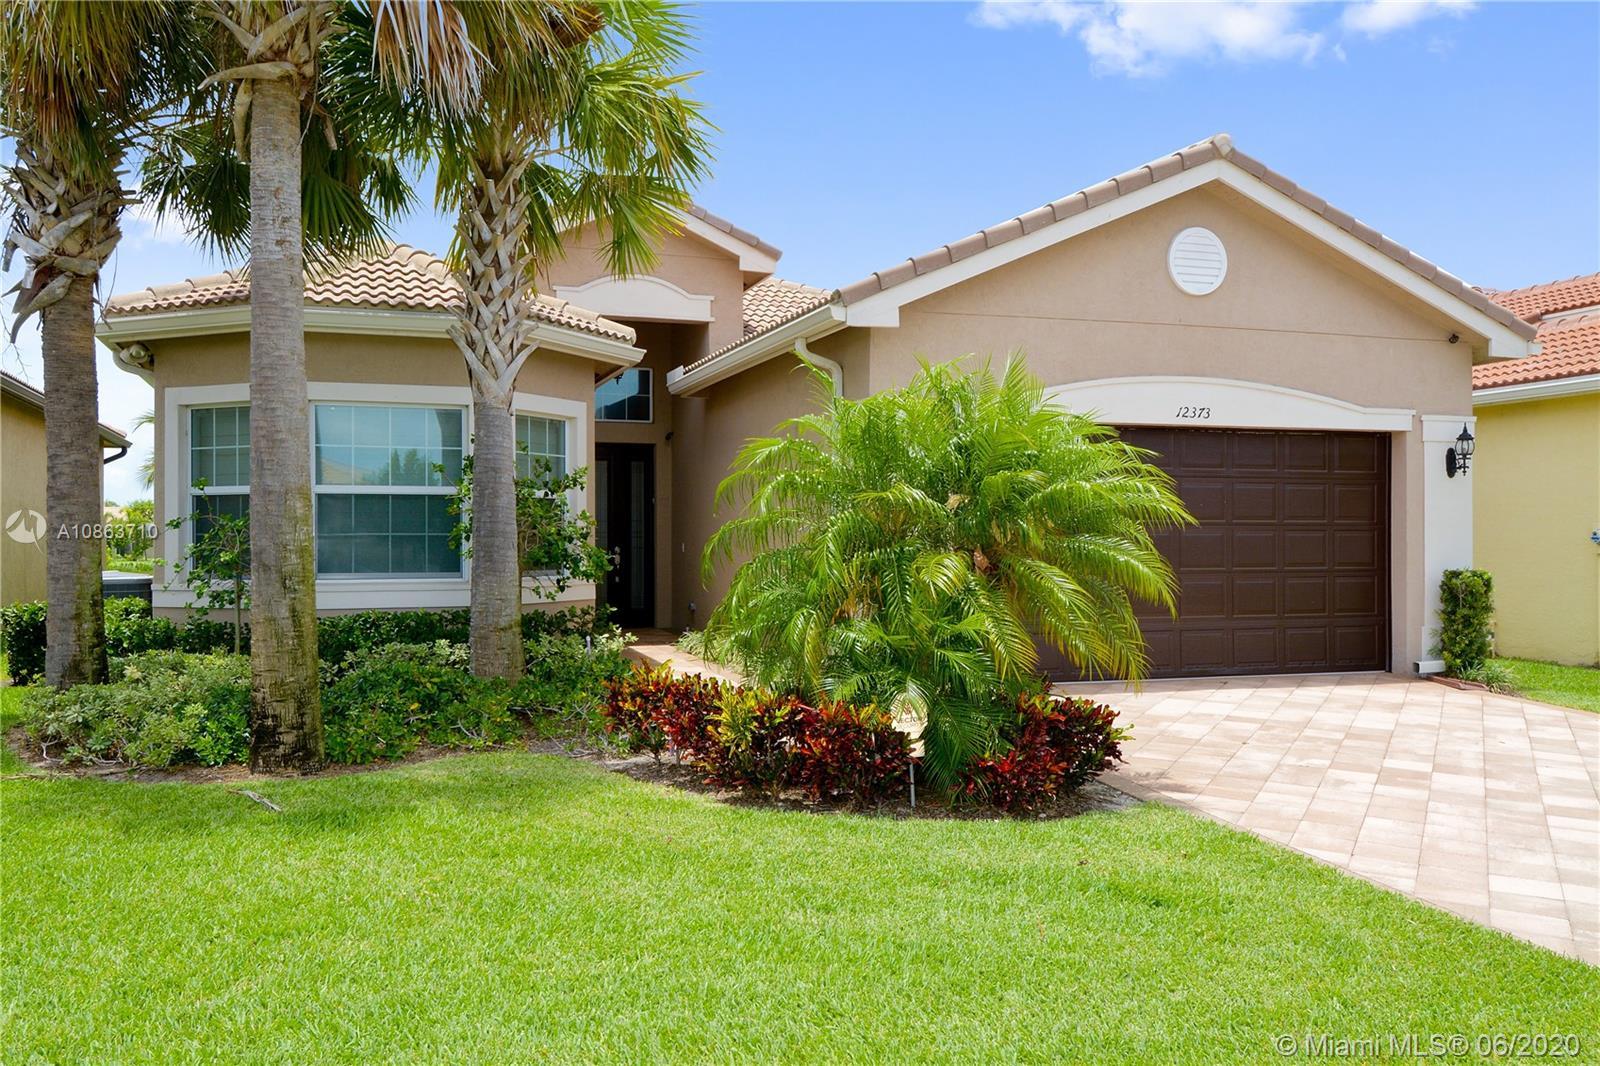 12373 Cascade Valley Ln Property Photo - Boynton Beach, FL real estate listing